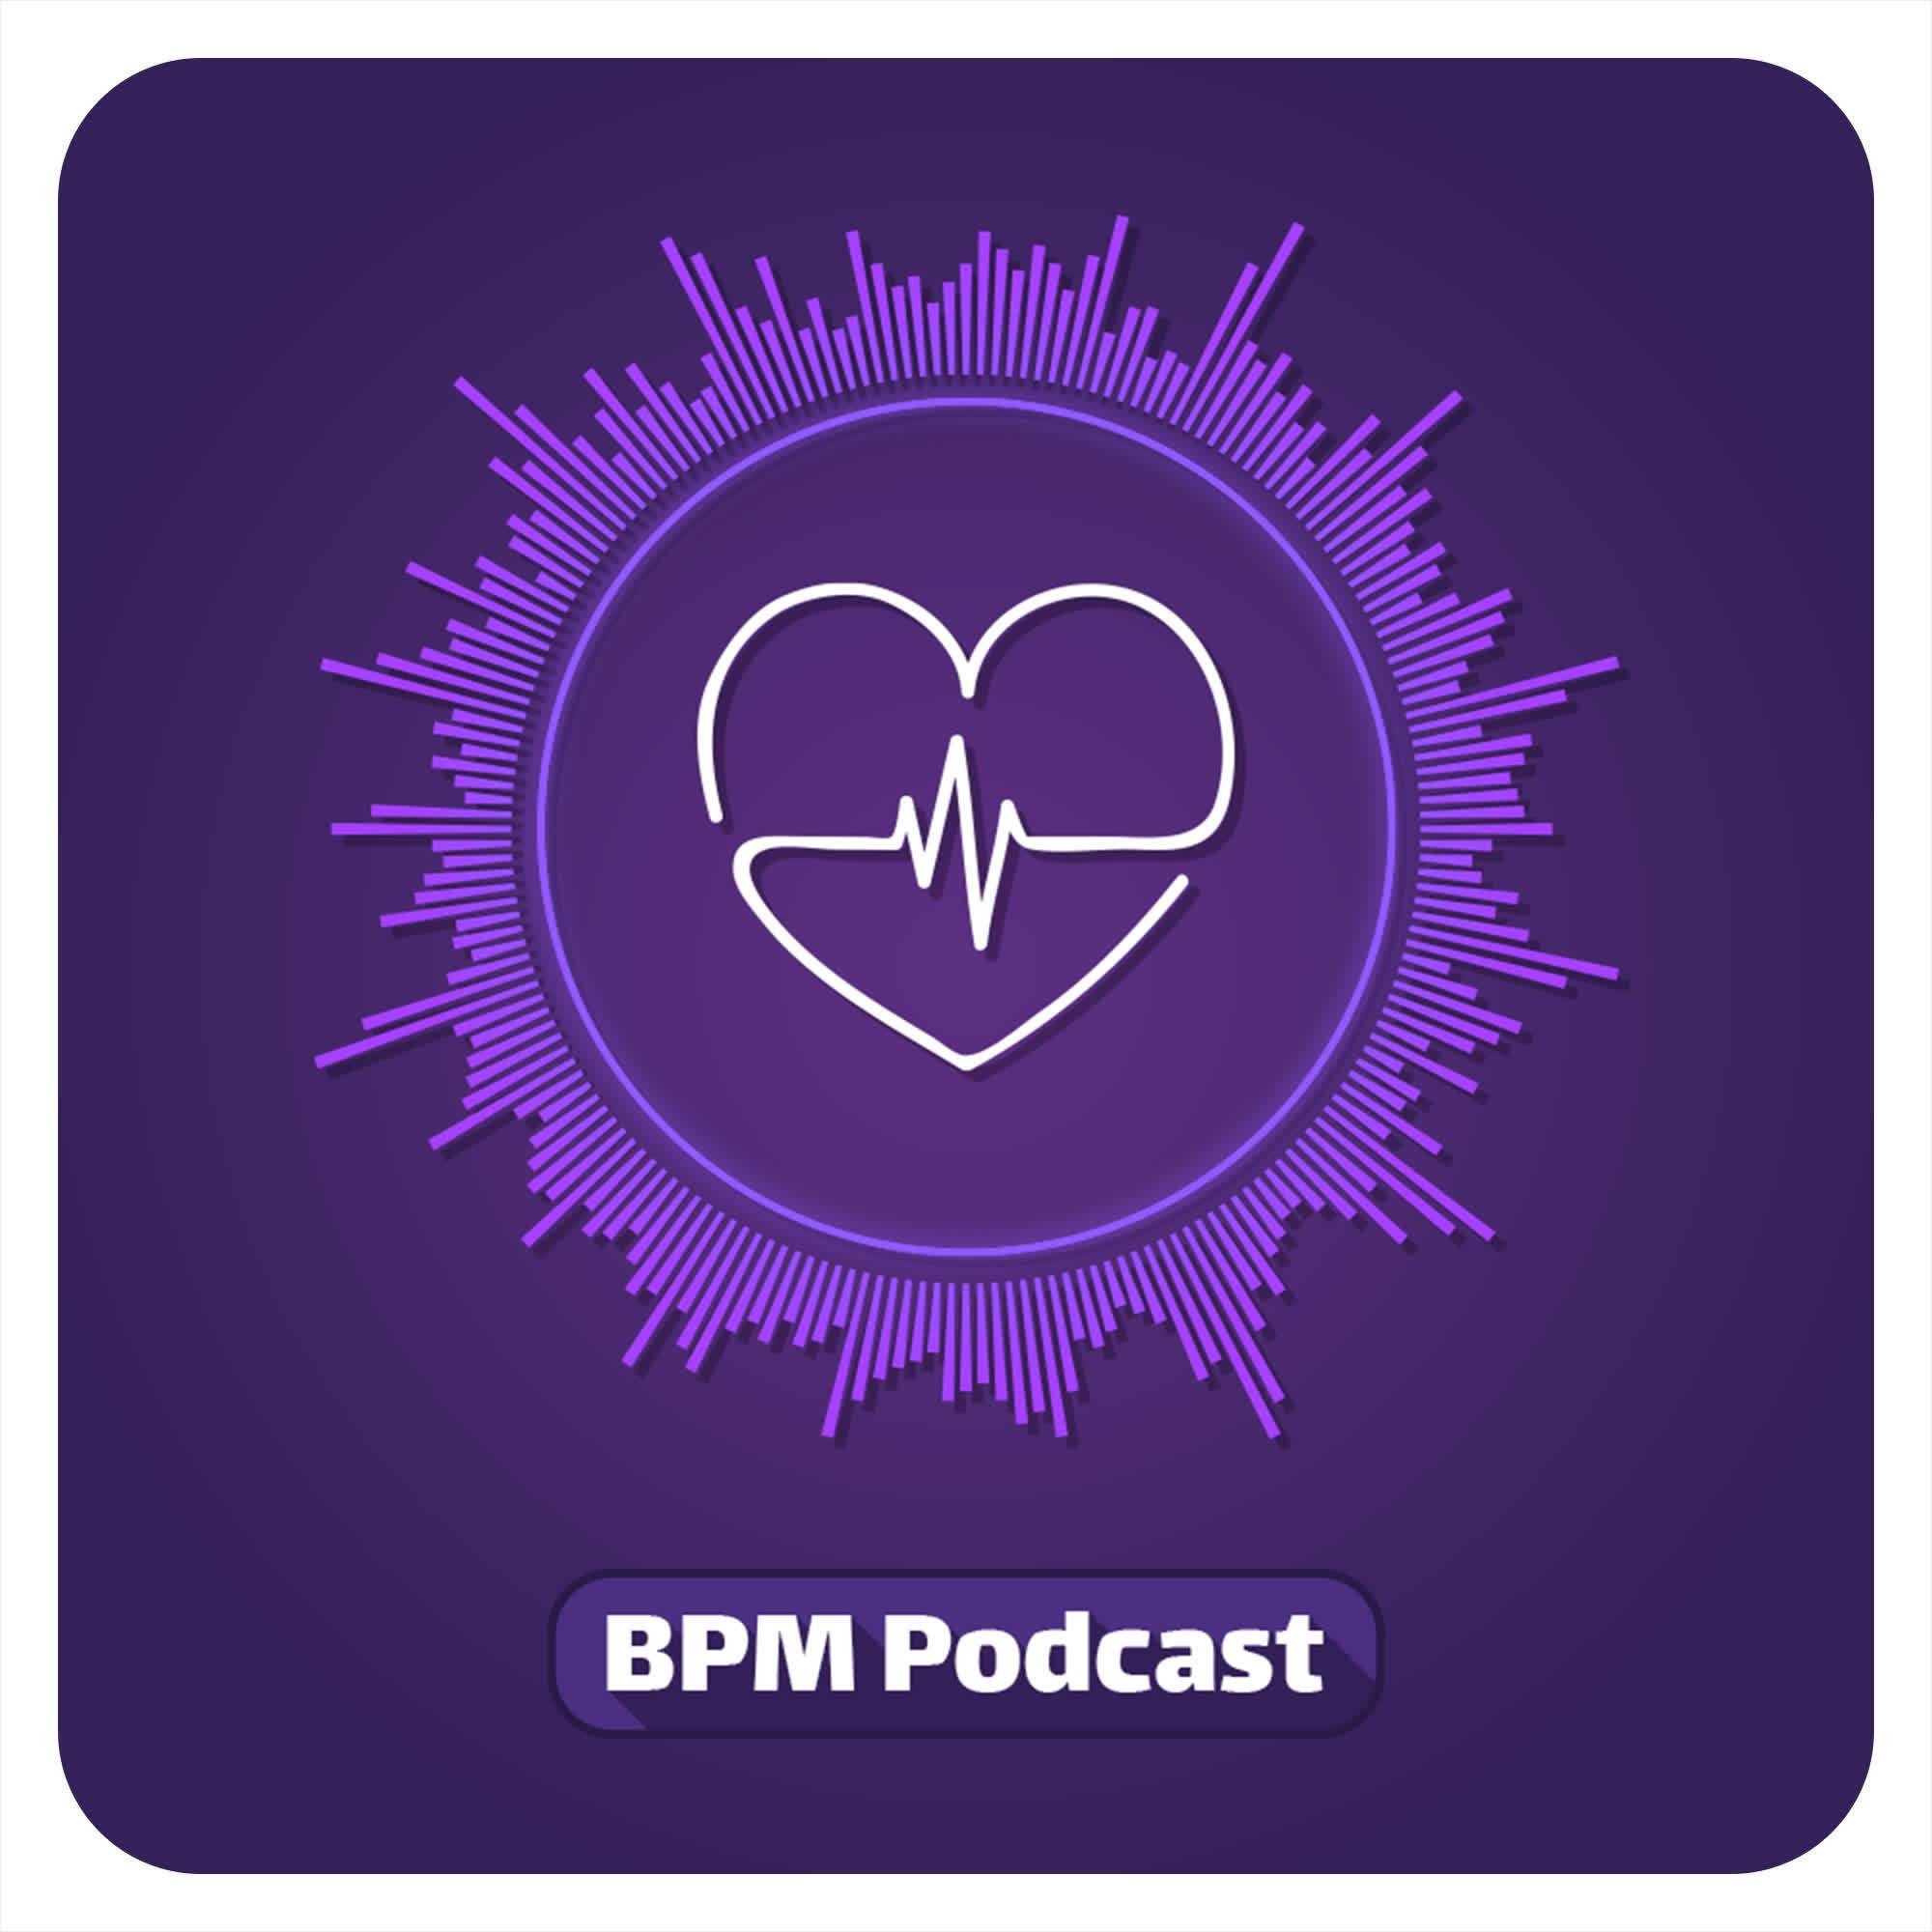 BPM Podcast